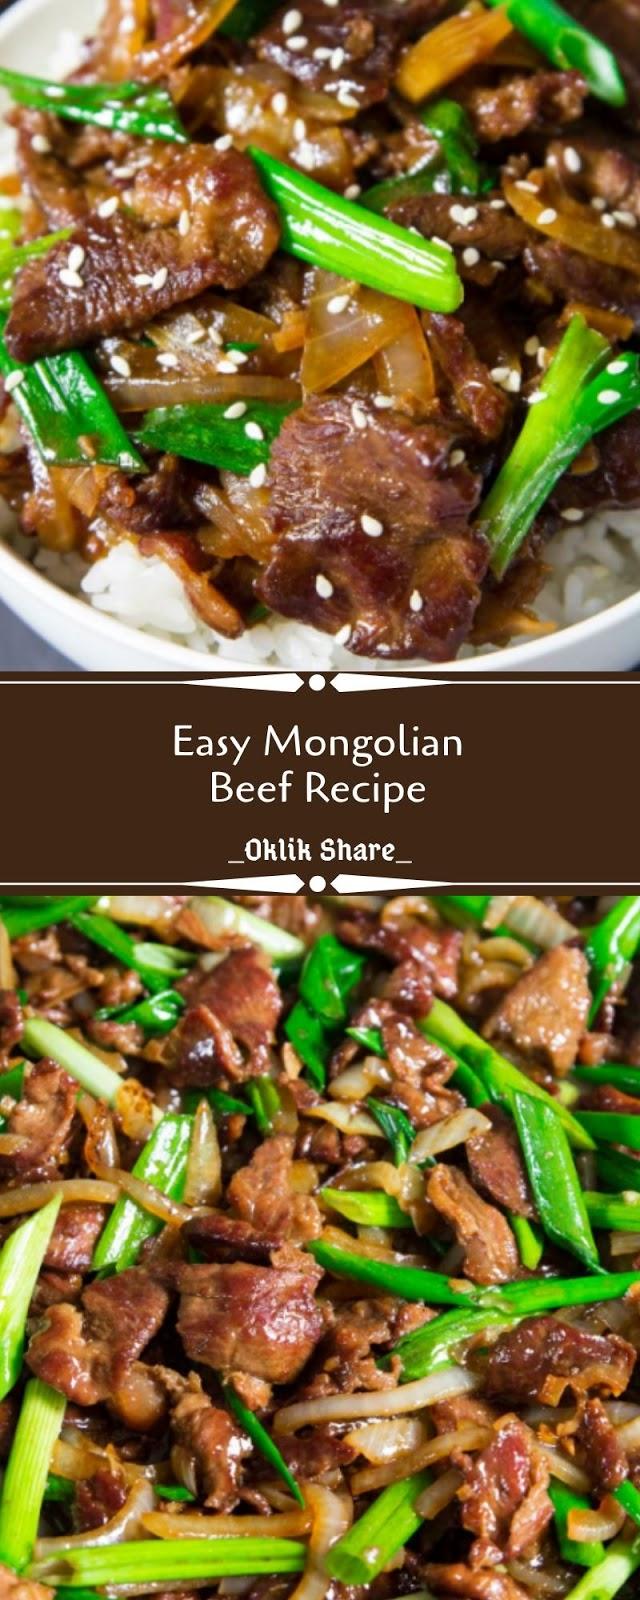 Easy Mongolian Beef Recipe - Oklik Share